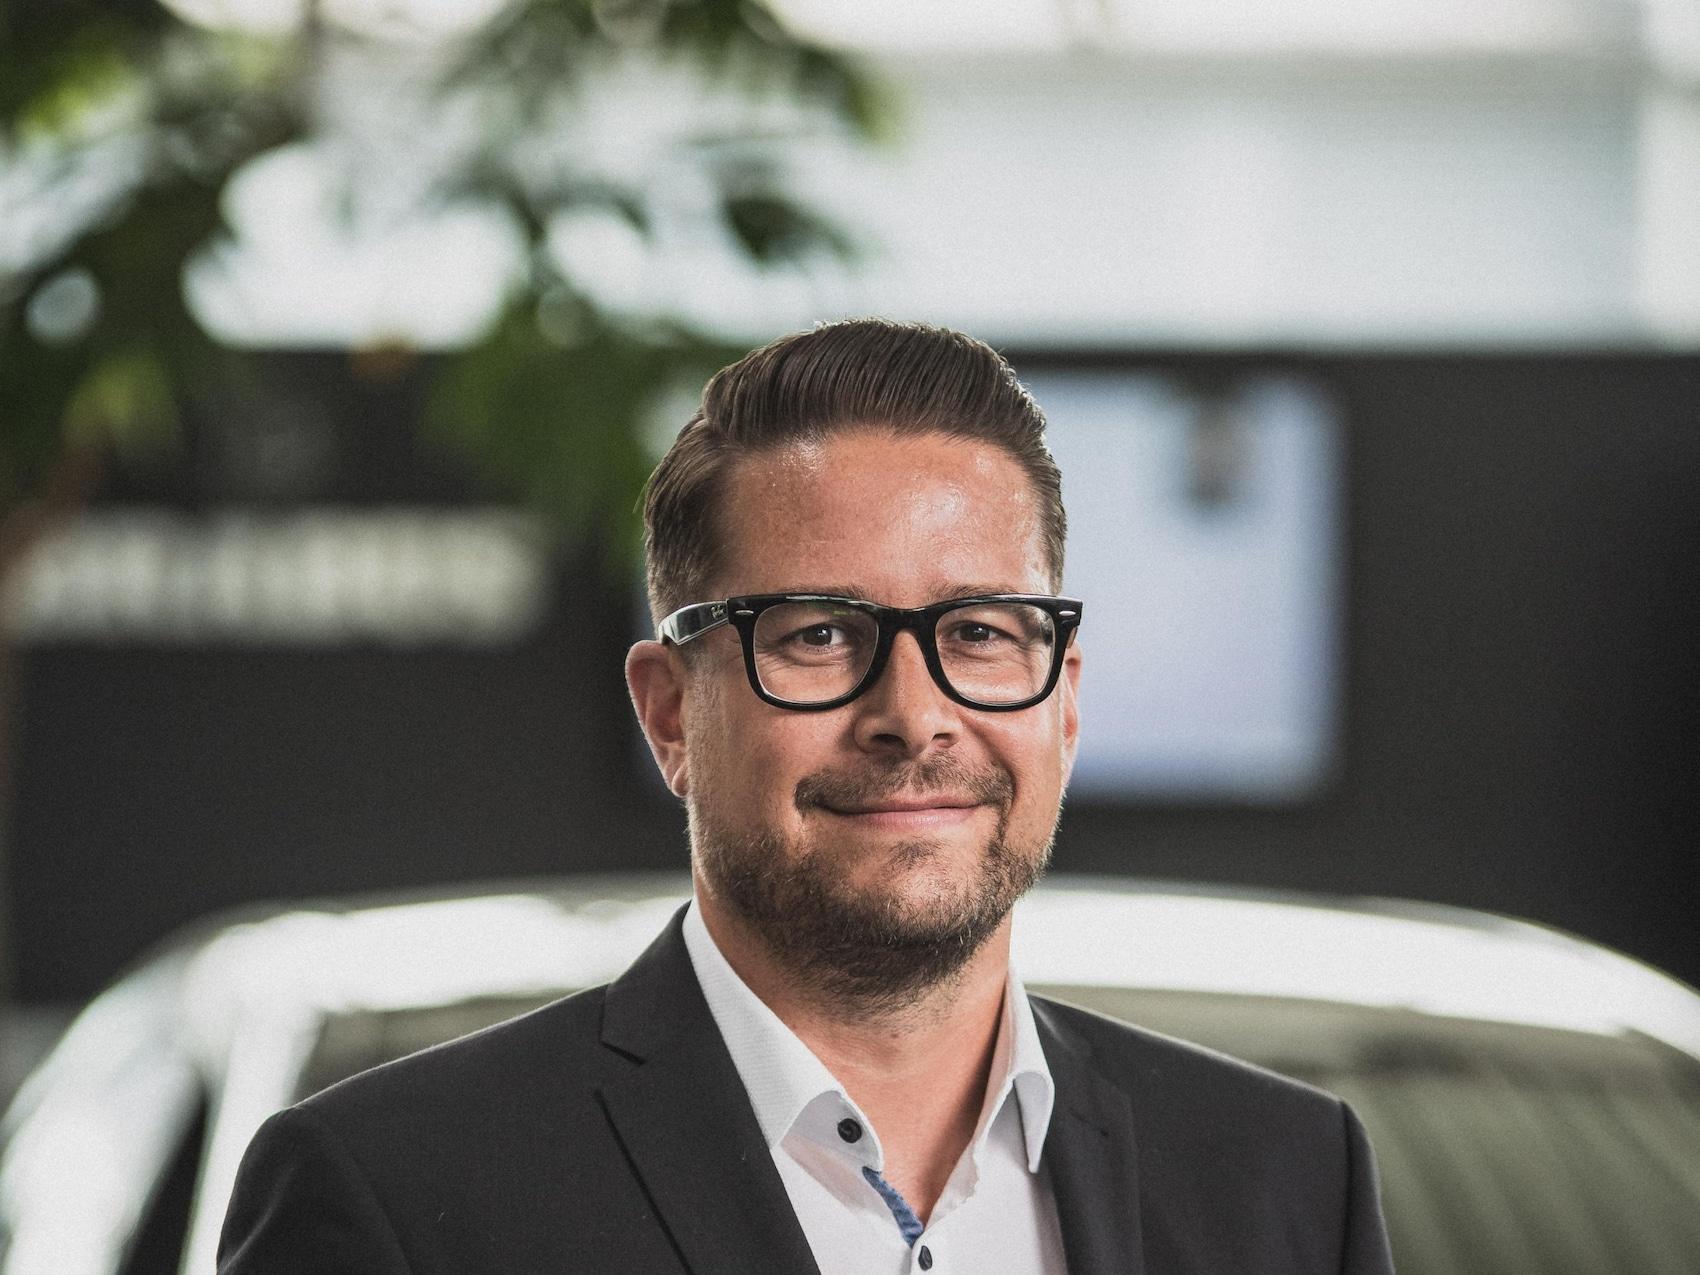 team-sc-Allgäu-Jendrok-Torsten